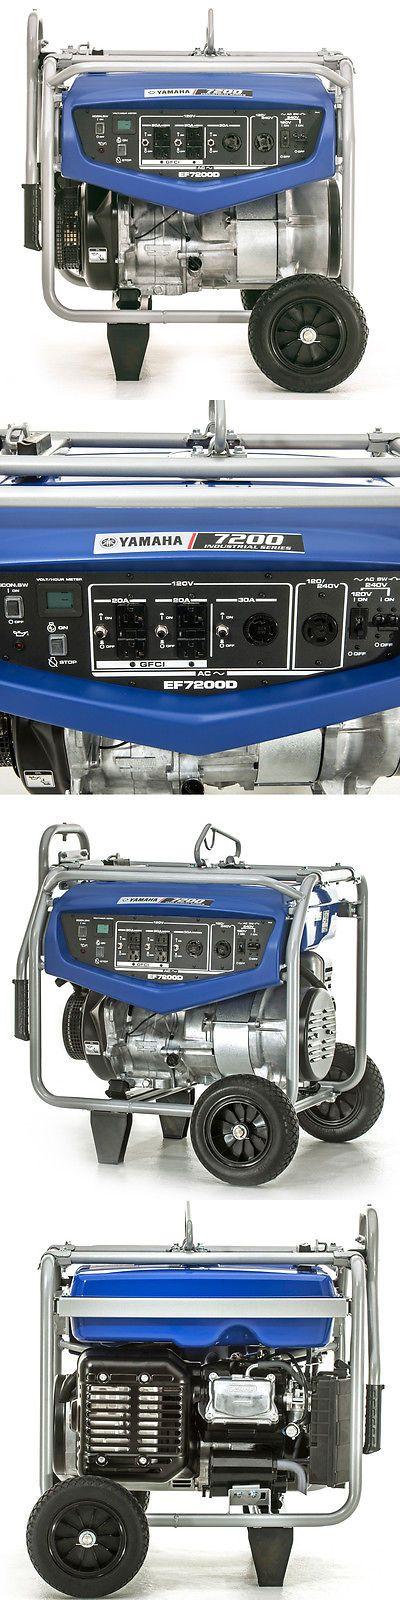 Generators 33082: Yamaha Ef7200d 7200 Watt Gas Powered Portable Rv Camping Home Backup Generator -> BUY IT NOW ONLY: $1299.99 on eBay!